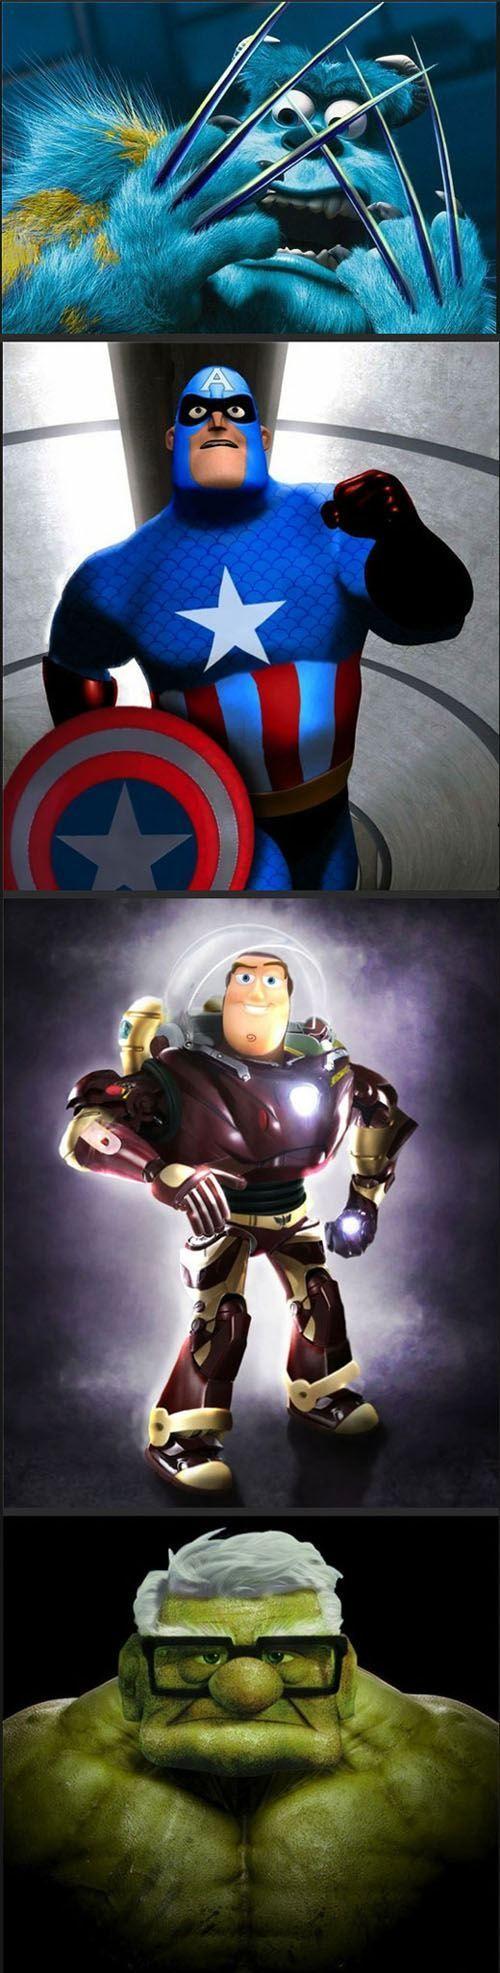 Disney Avengers - HA!